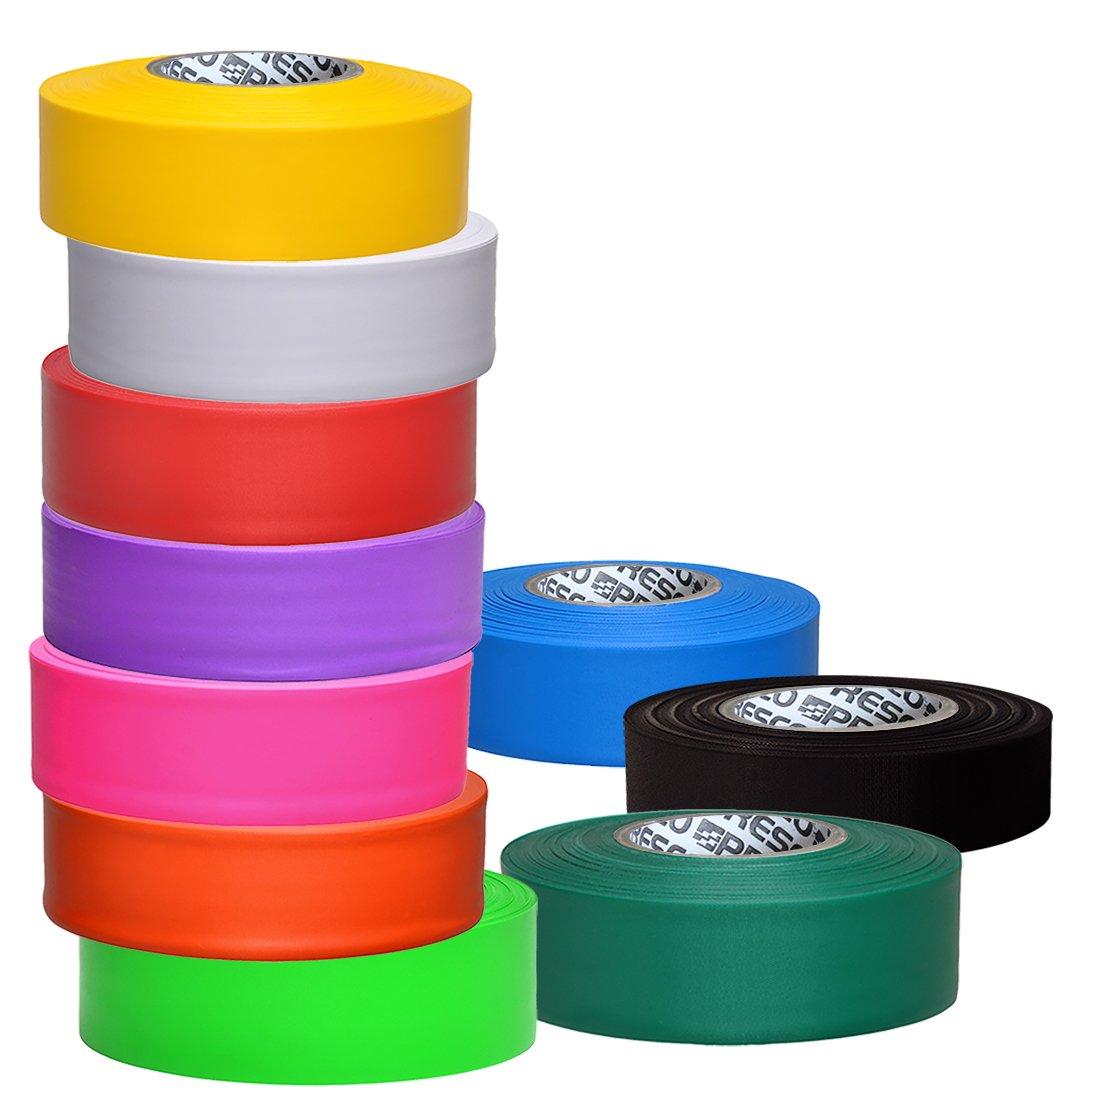 Presco Taffeta Roll Flagging Tape 1-3//16 in x 300 ft. Green